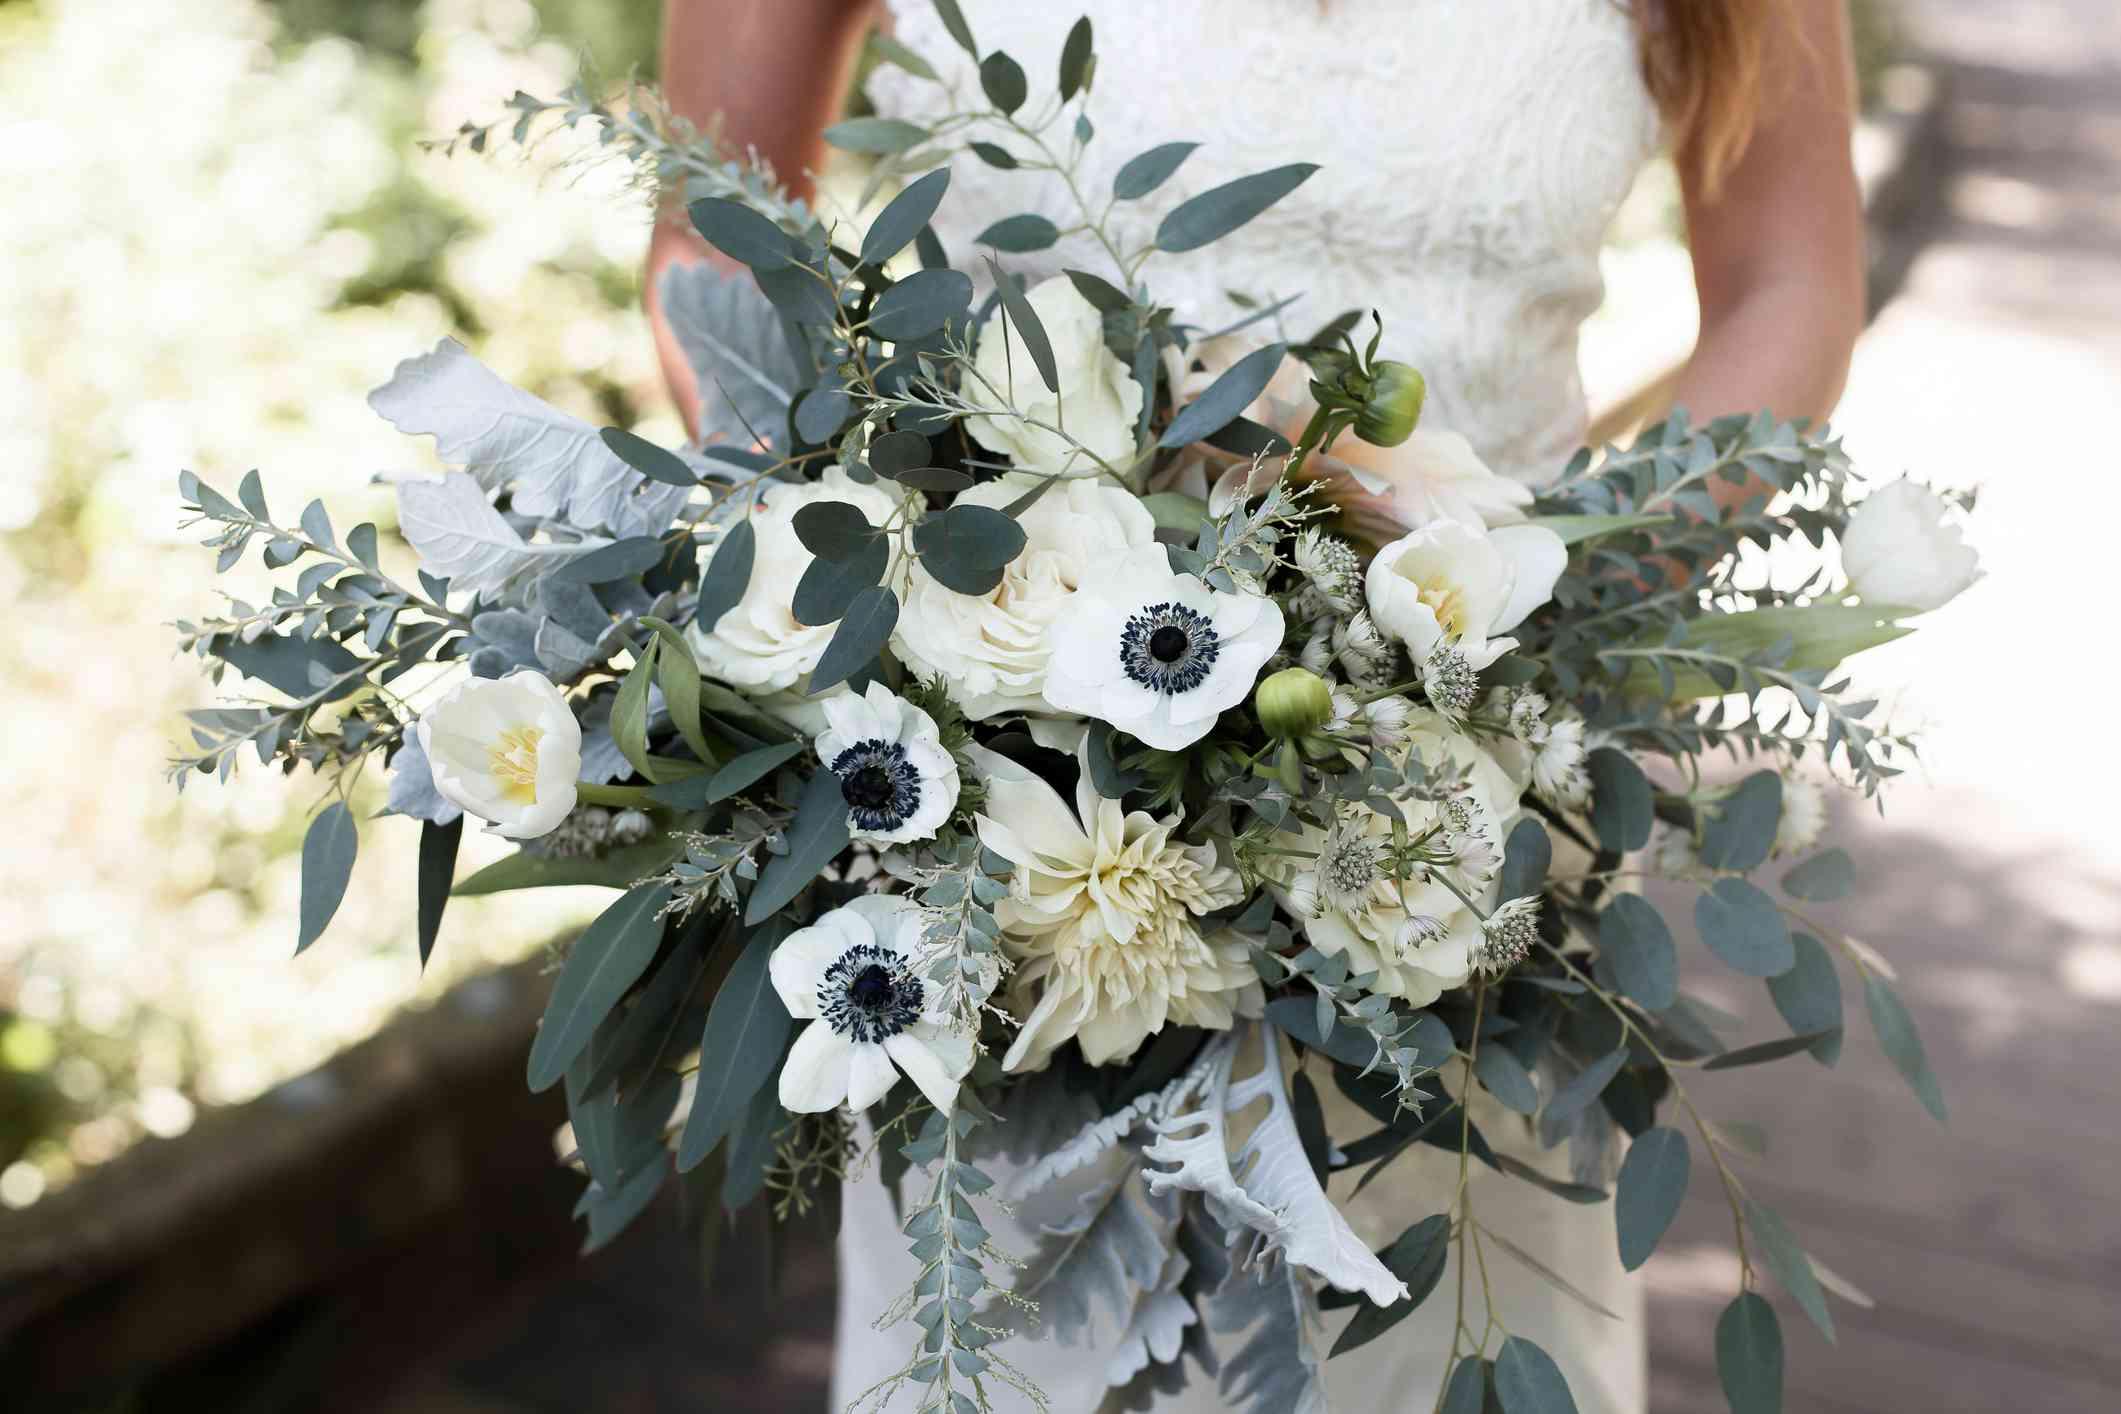 Ramo de novia blanco con vegetación